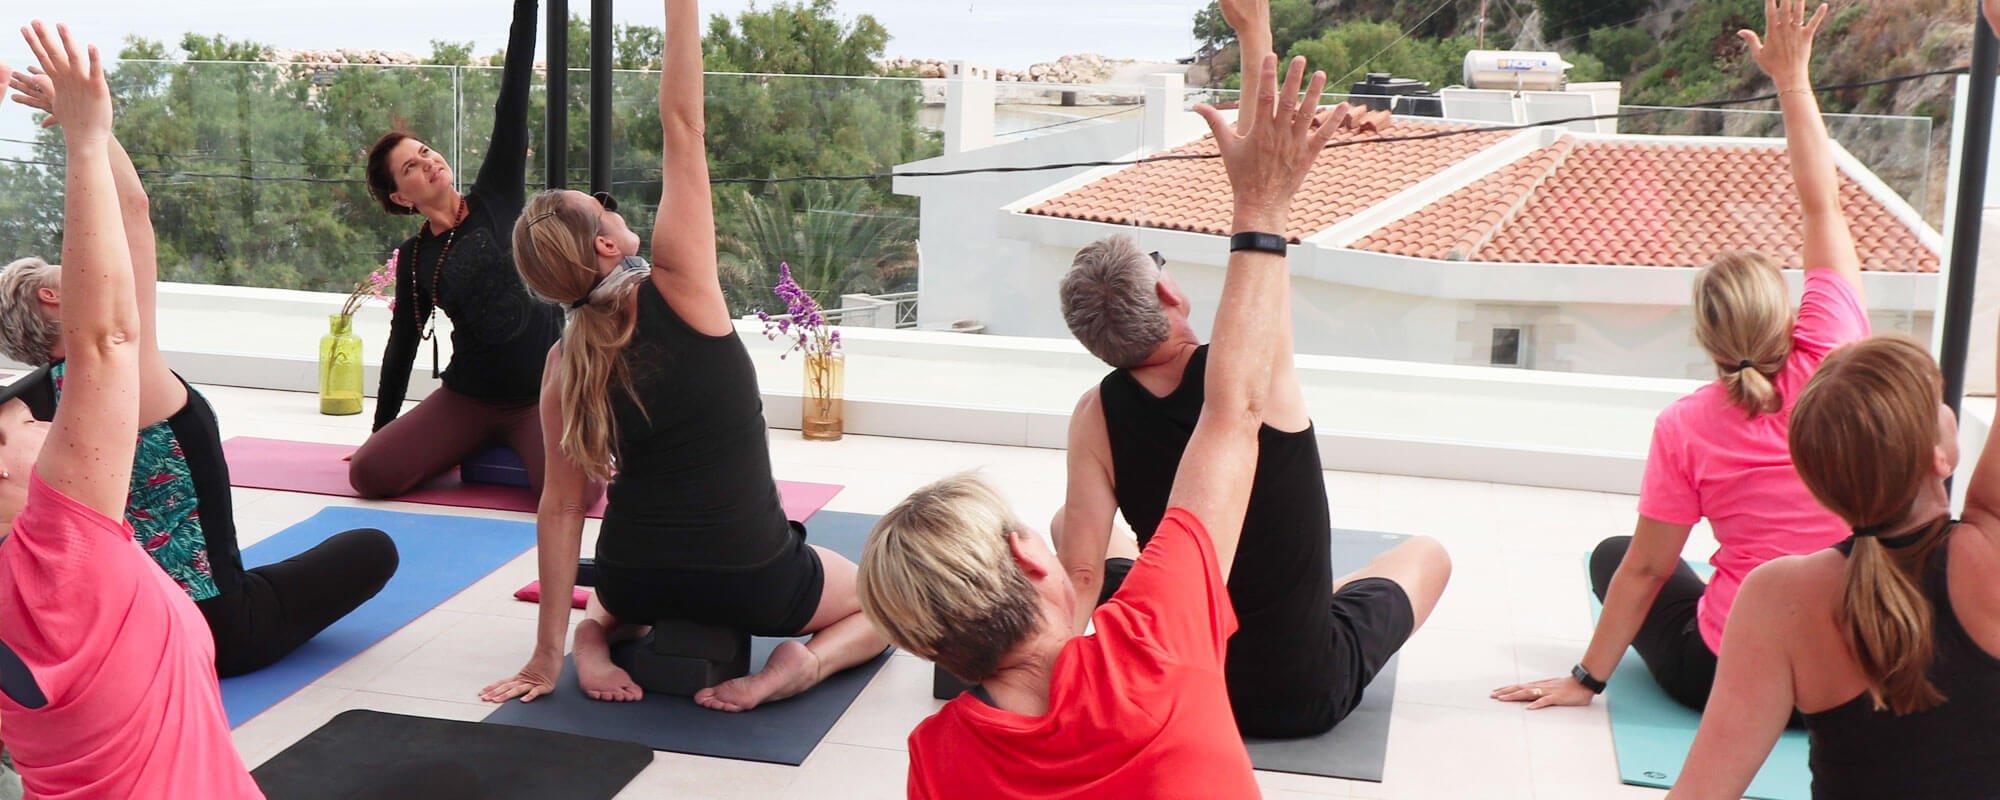 yogaferie_kreta_2